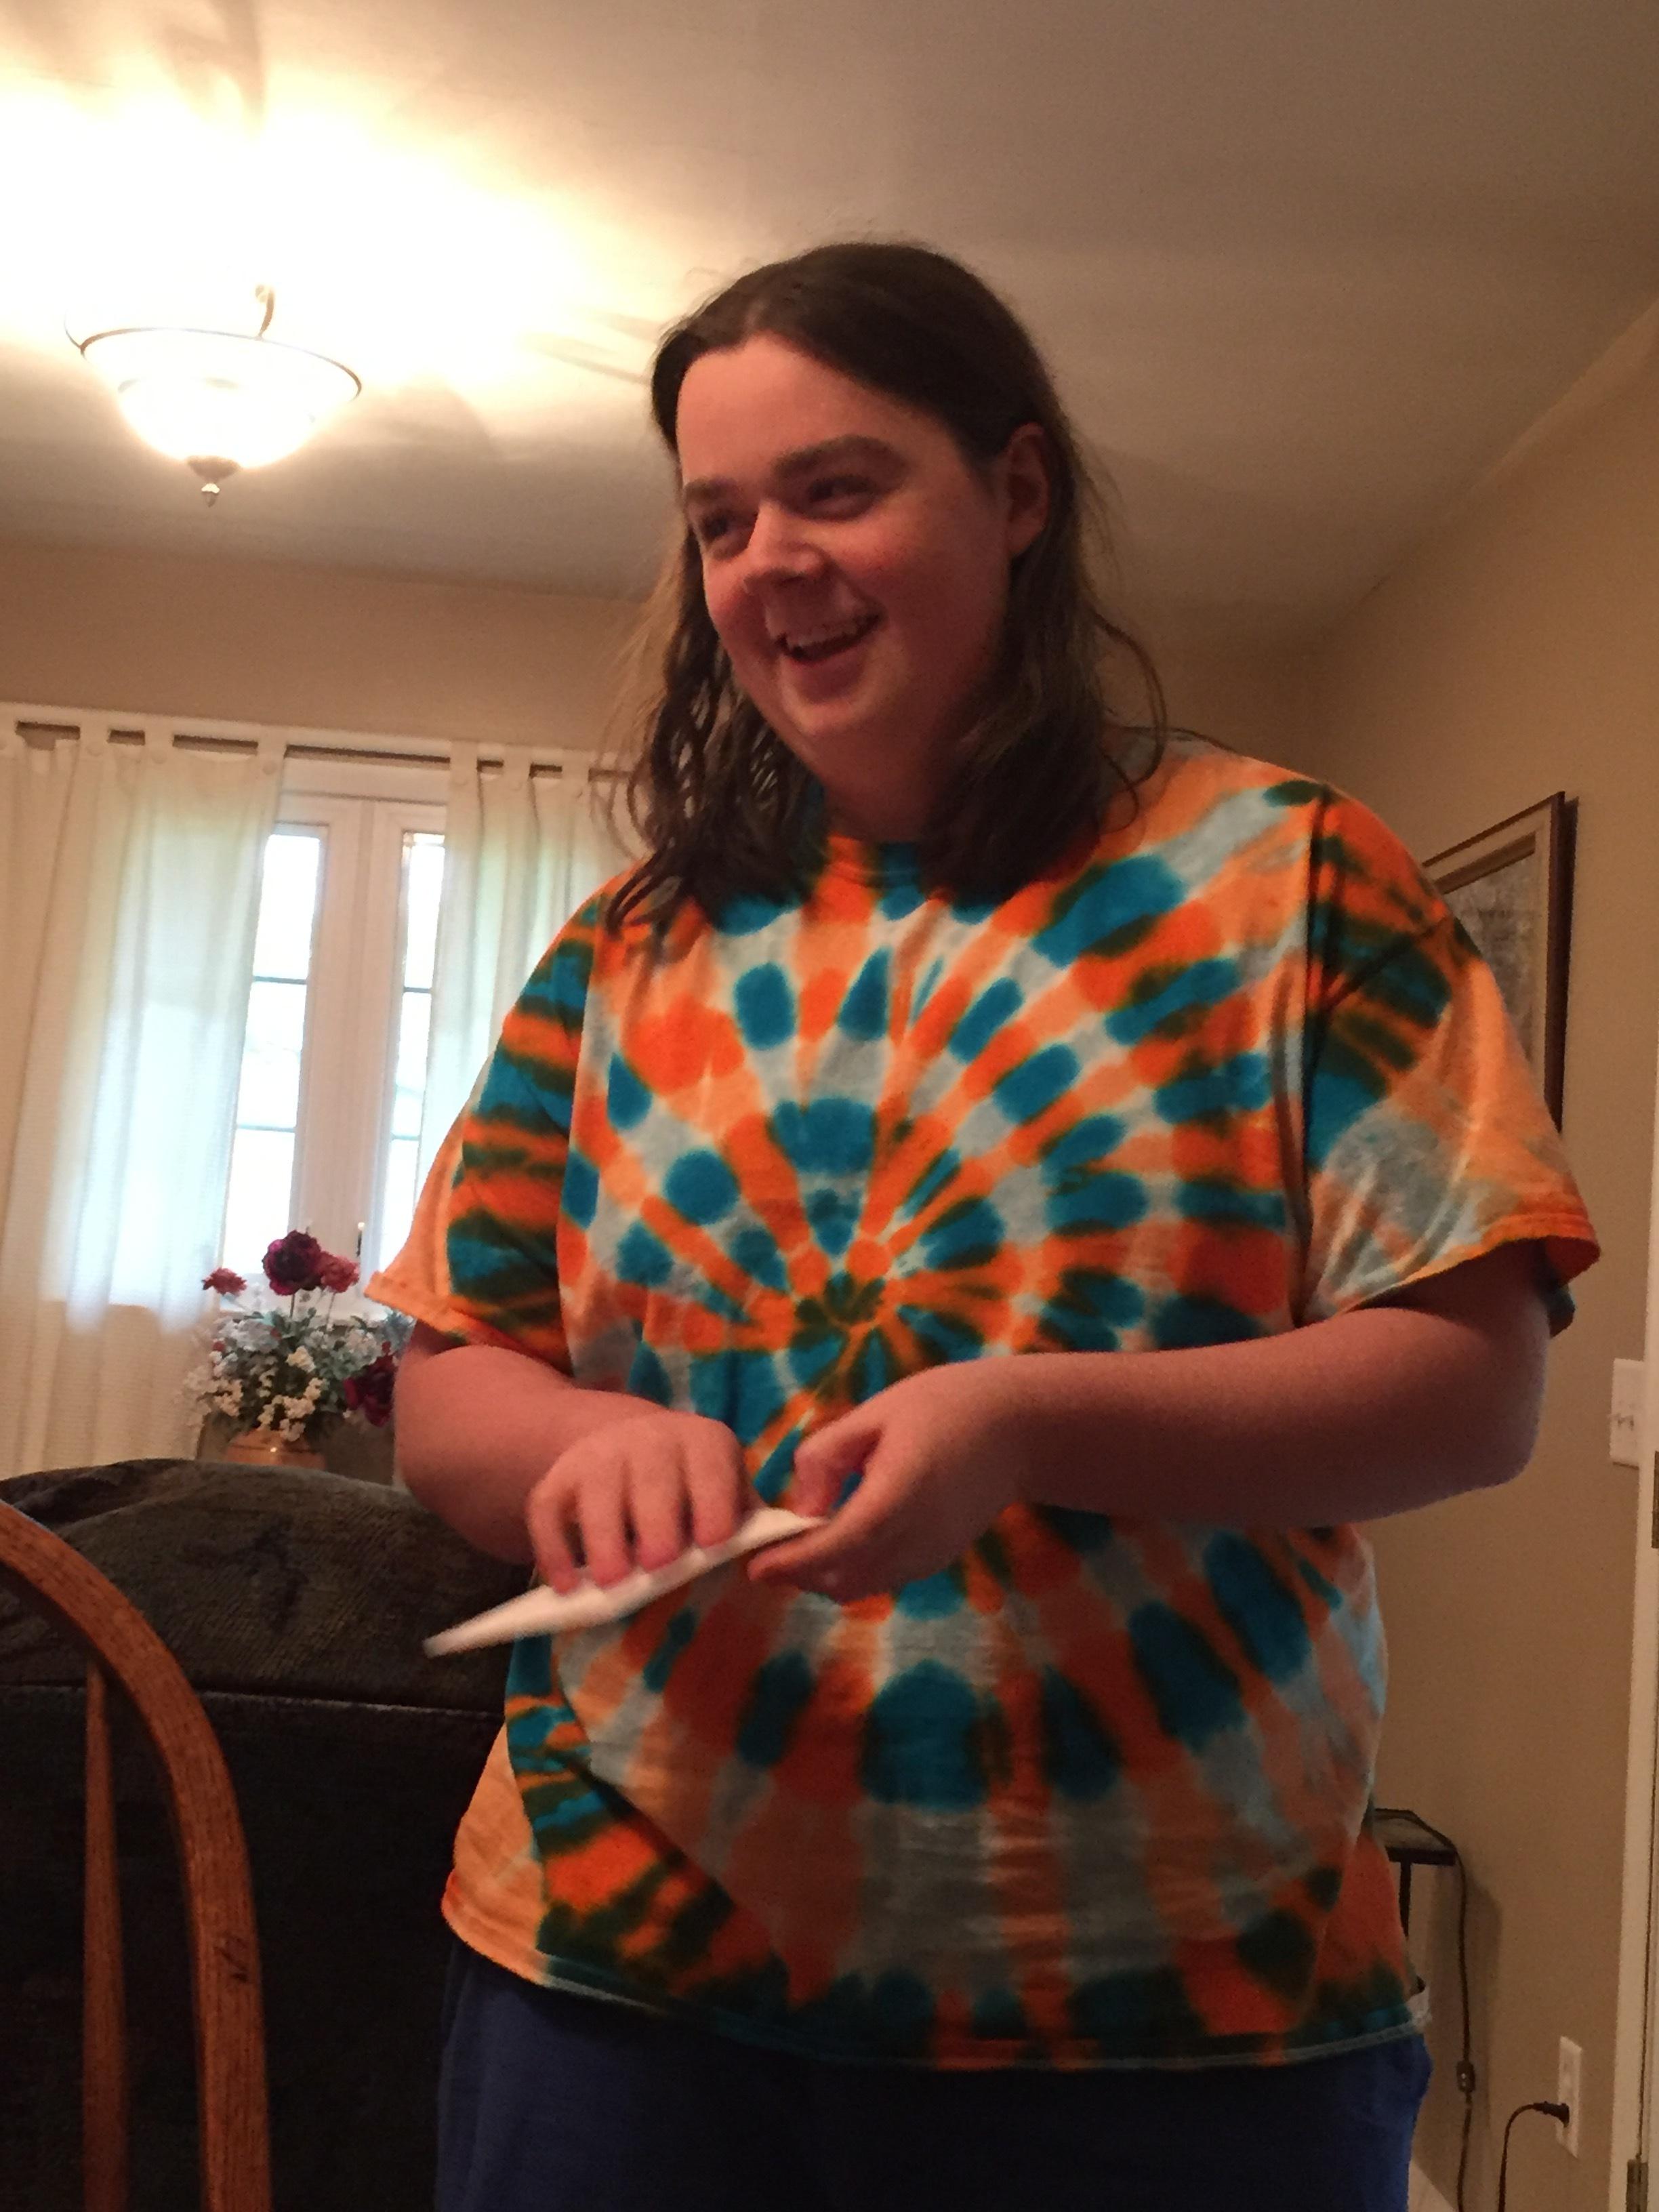 Another tie dye birthday